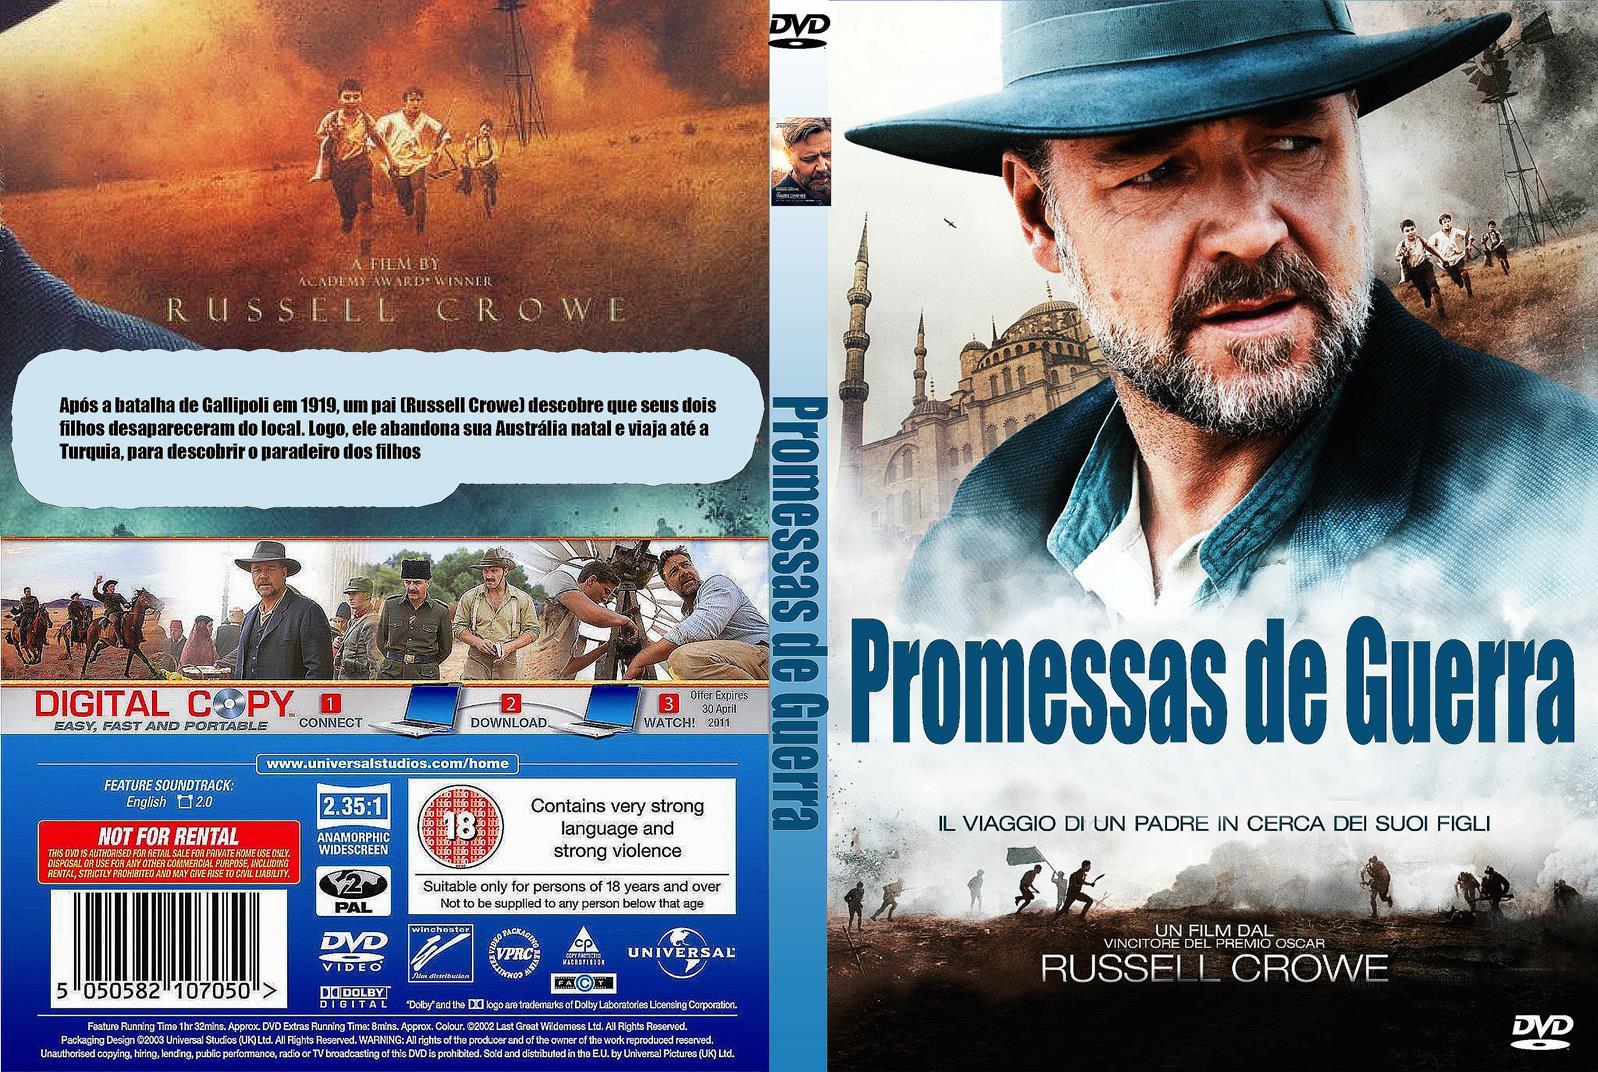 Download Promessas de Guerra DVD-R Promessas 2Bde 2BGuerra 2B